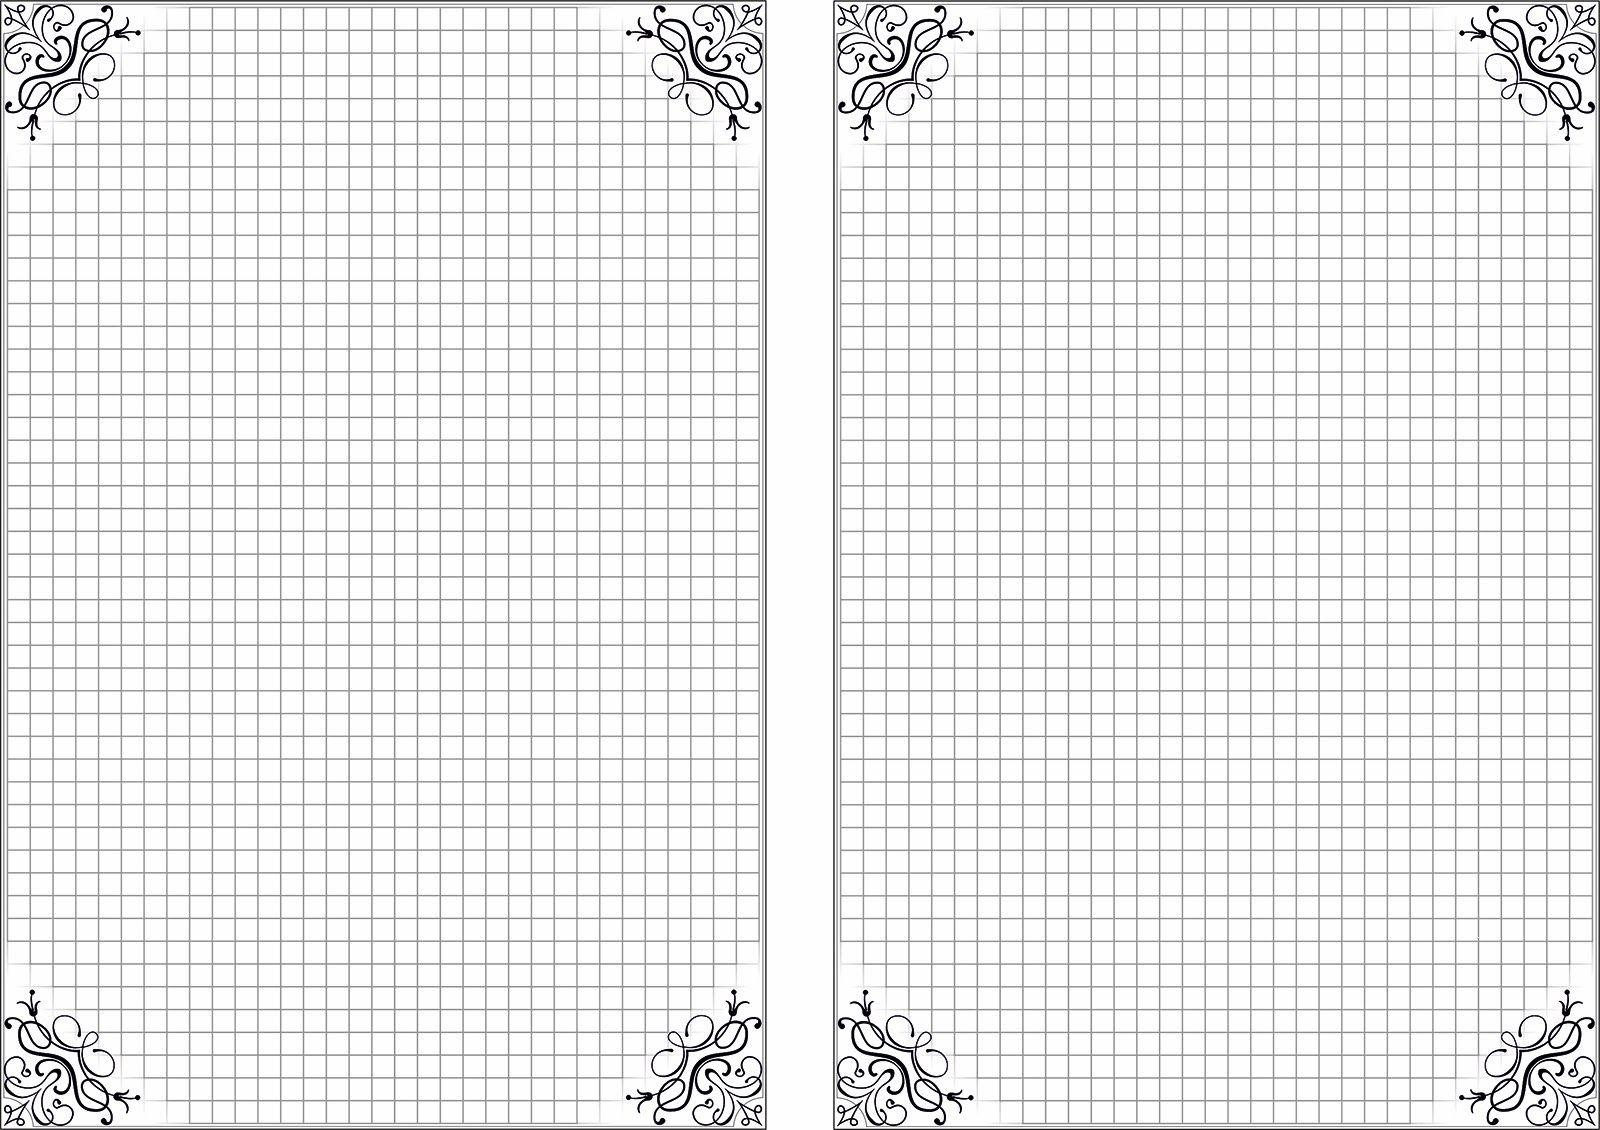 Страницы для блокнота шаблоны а6, восьмым